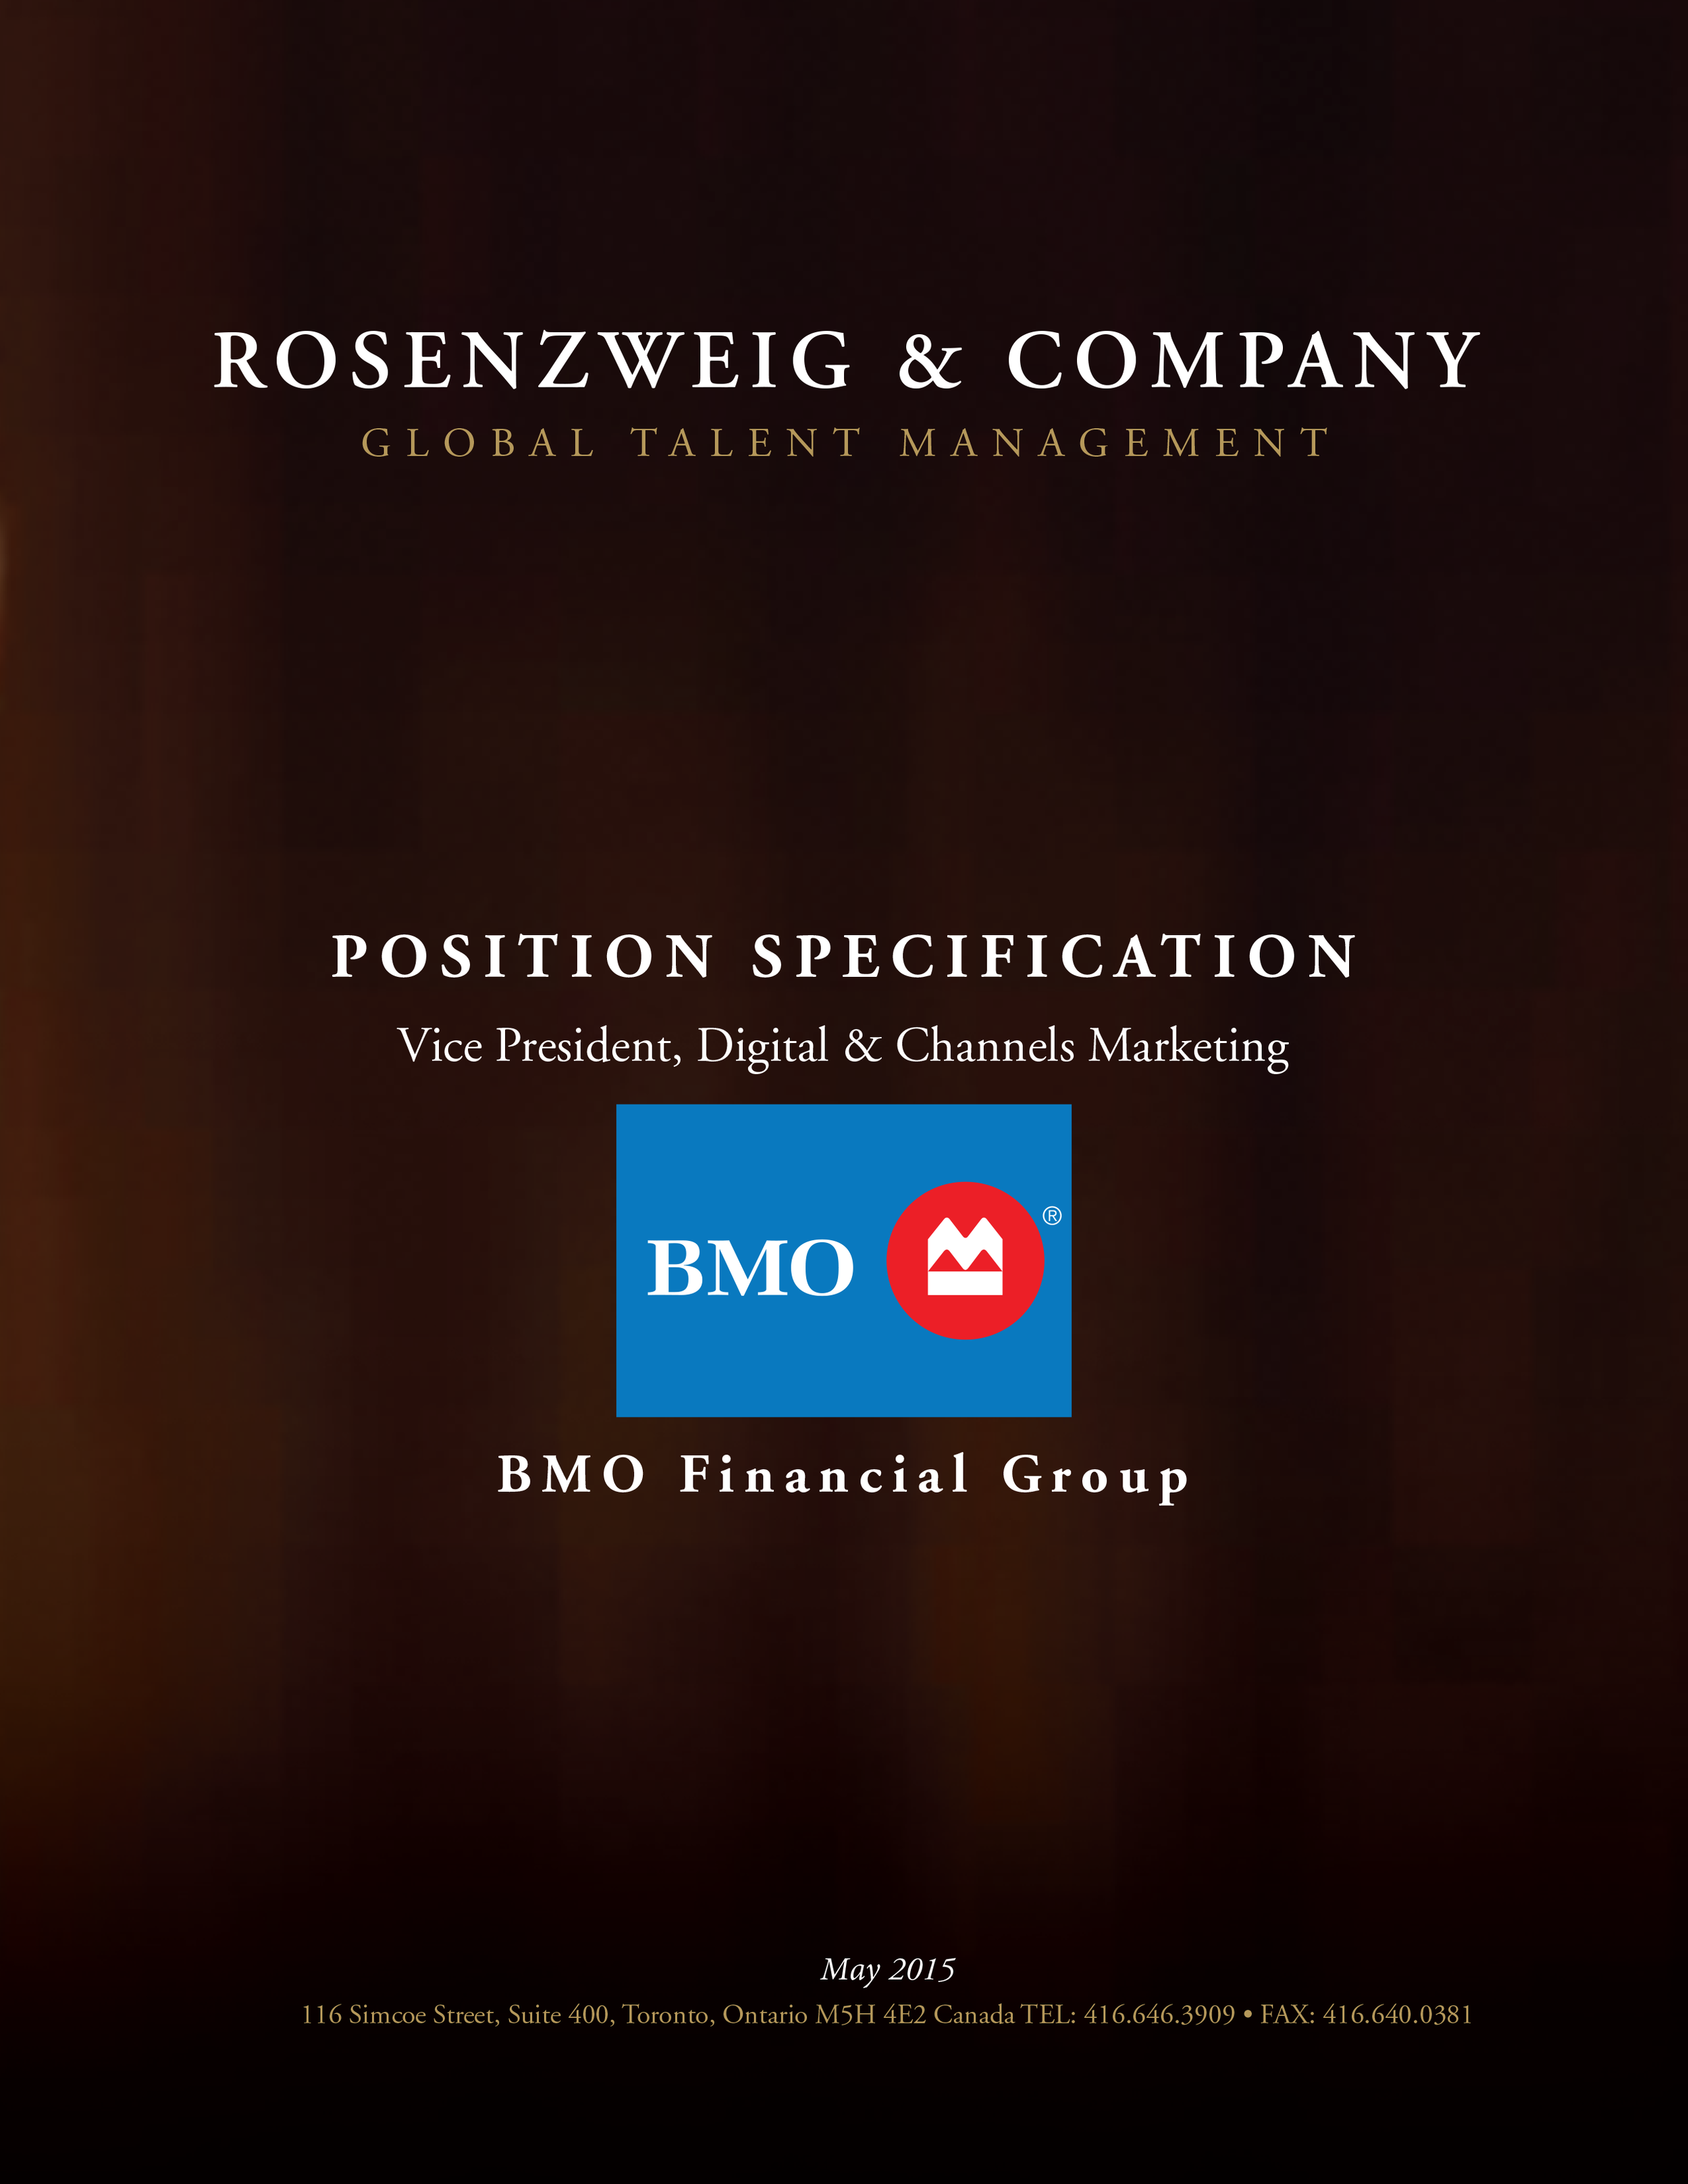 BMO - Vice President, Digital & Channels Marketing